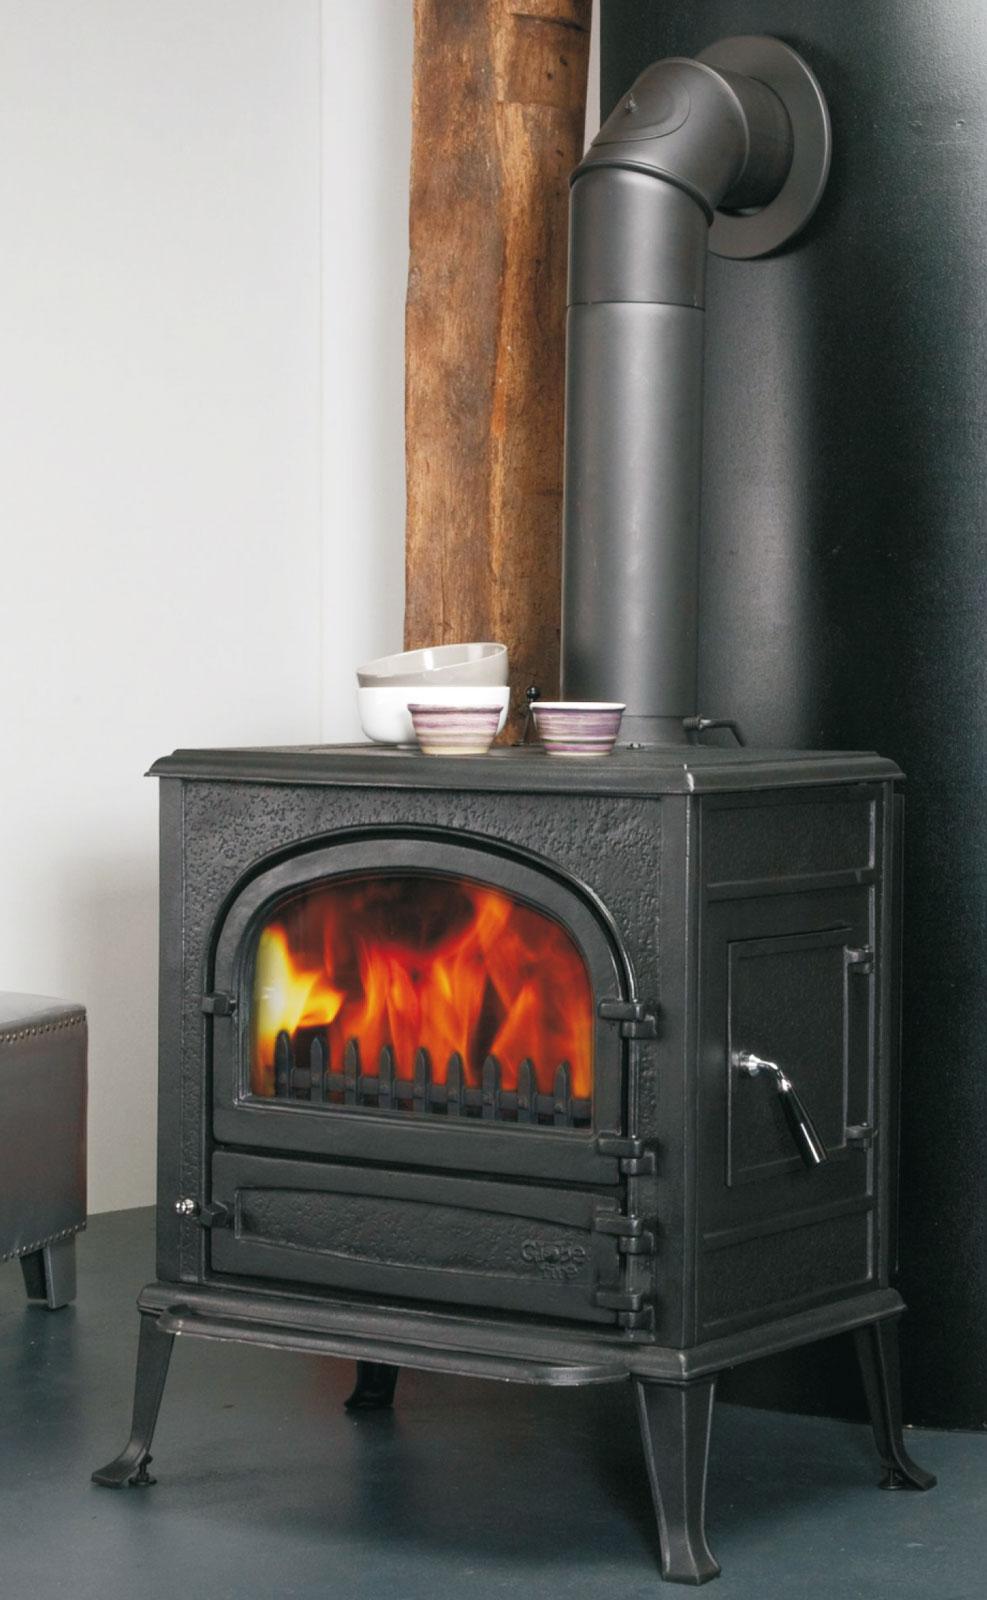 kaminofen globe fire neptun raumluftunabh ngig vollguss schwarz 7kw bei. Black Bedroom Furniture Sets. Home Design Ideas